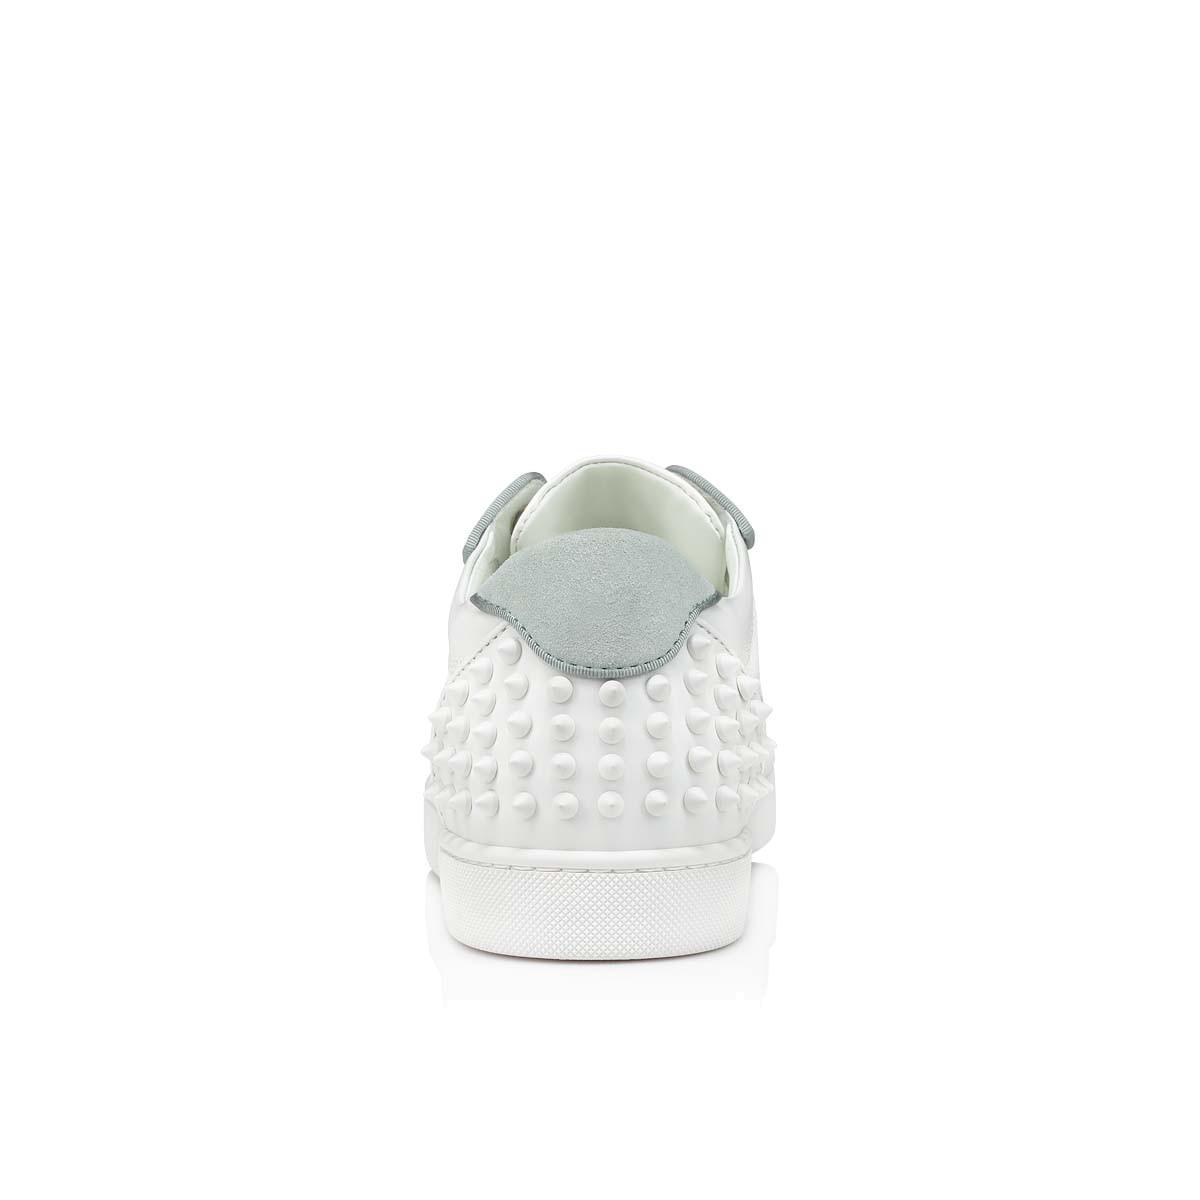 Shoes - Seavaste 2 Orlato Flat - Christian Louboutin